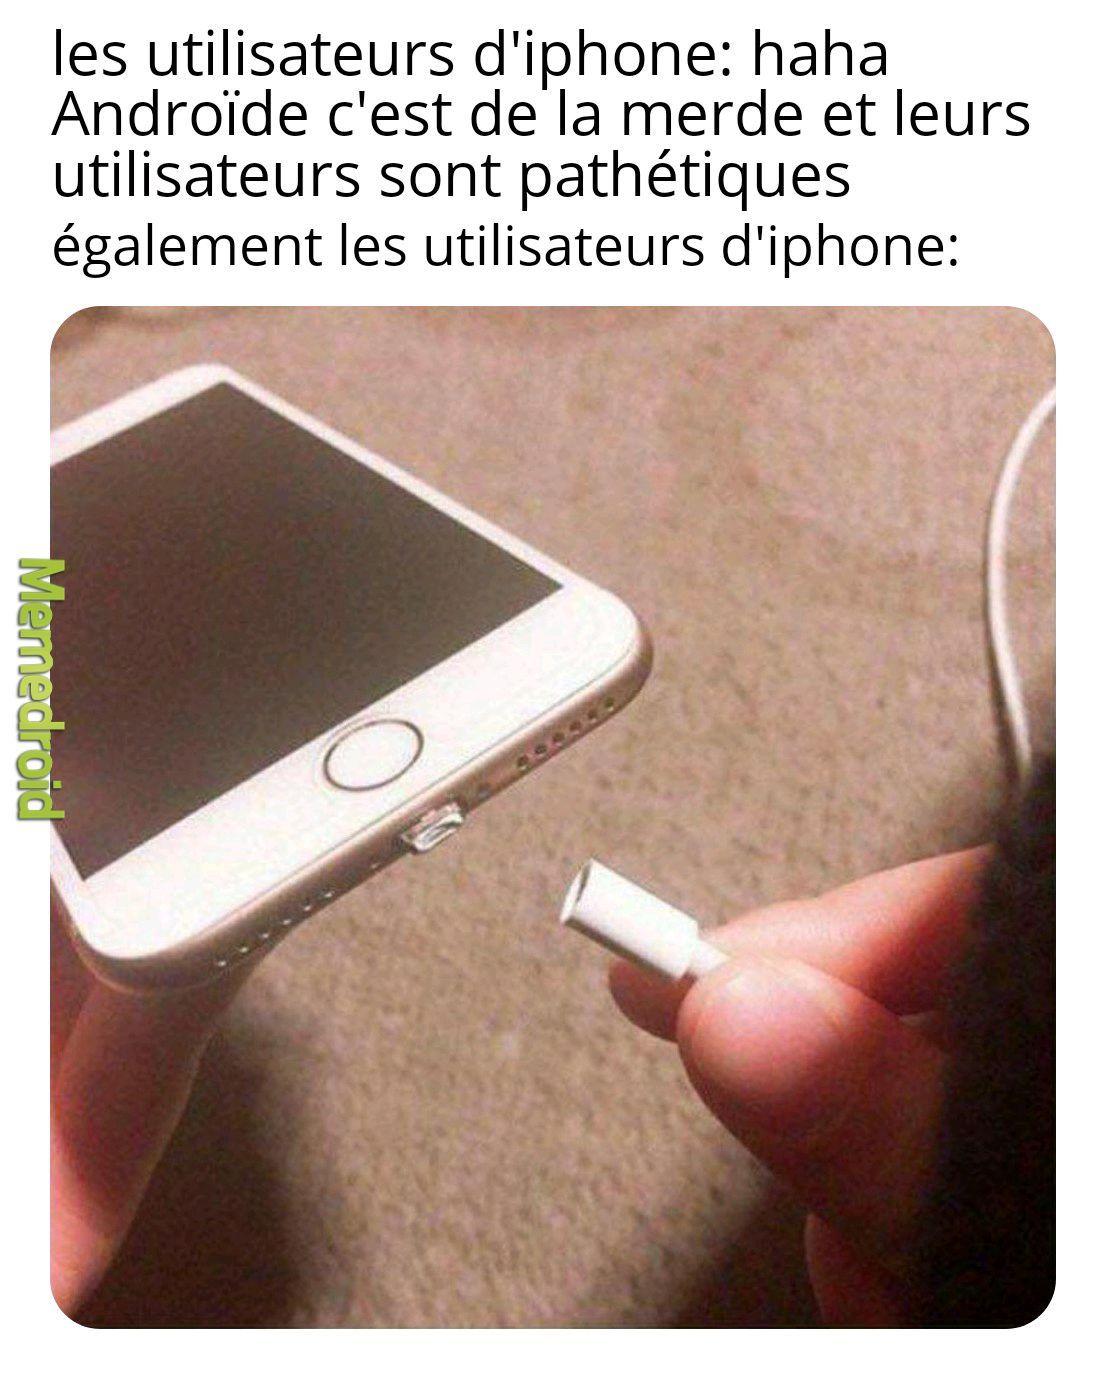 Les iphone - meme